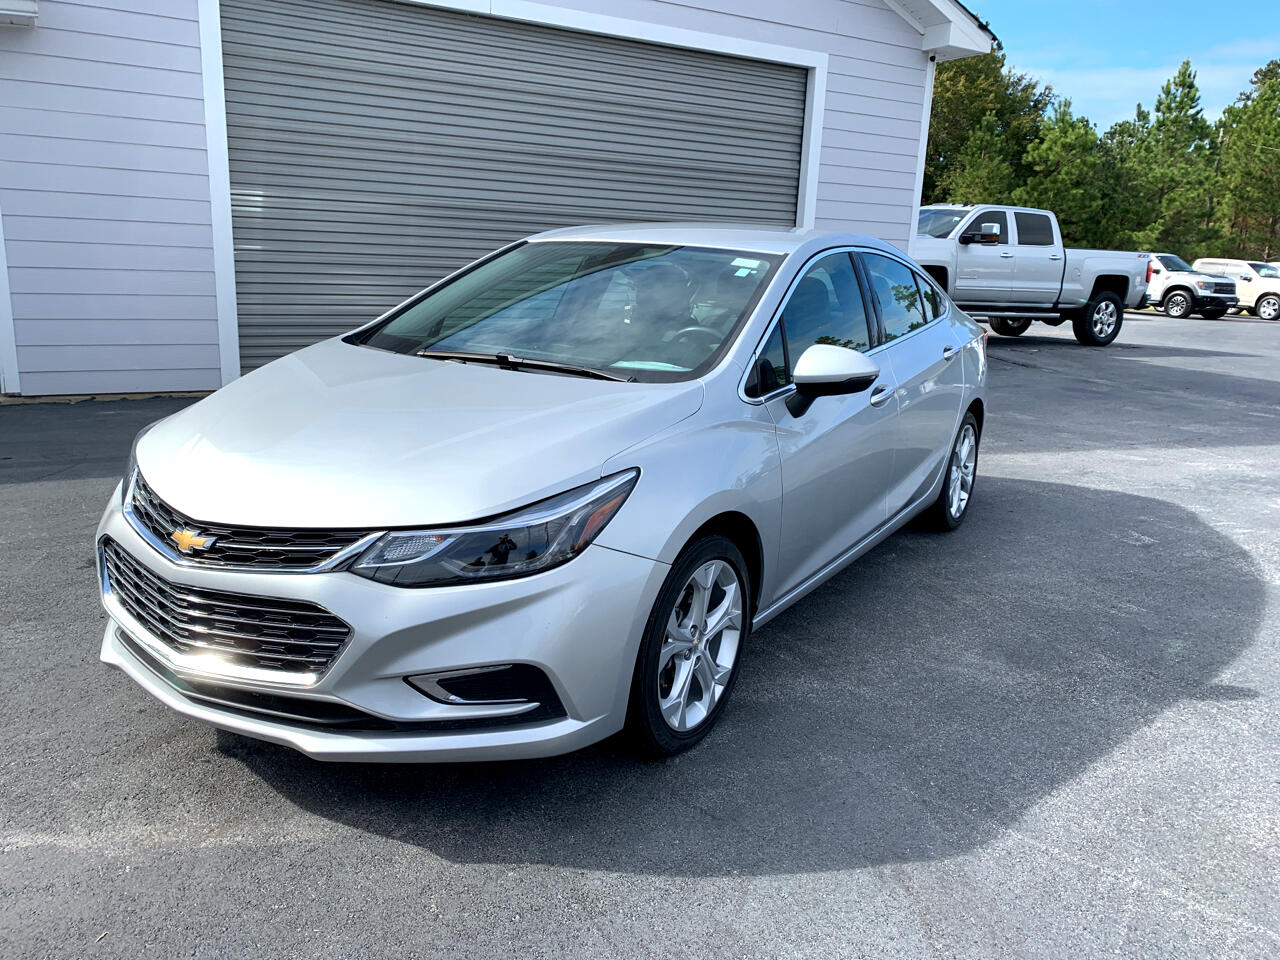 Chevrolet Cruze 4dr Sdn 1.4L Premier w/1SF 2018